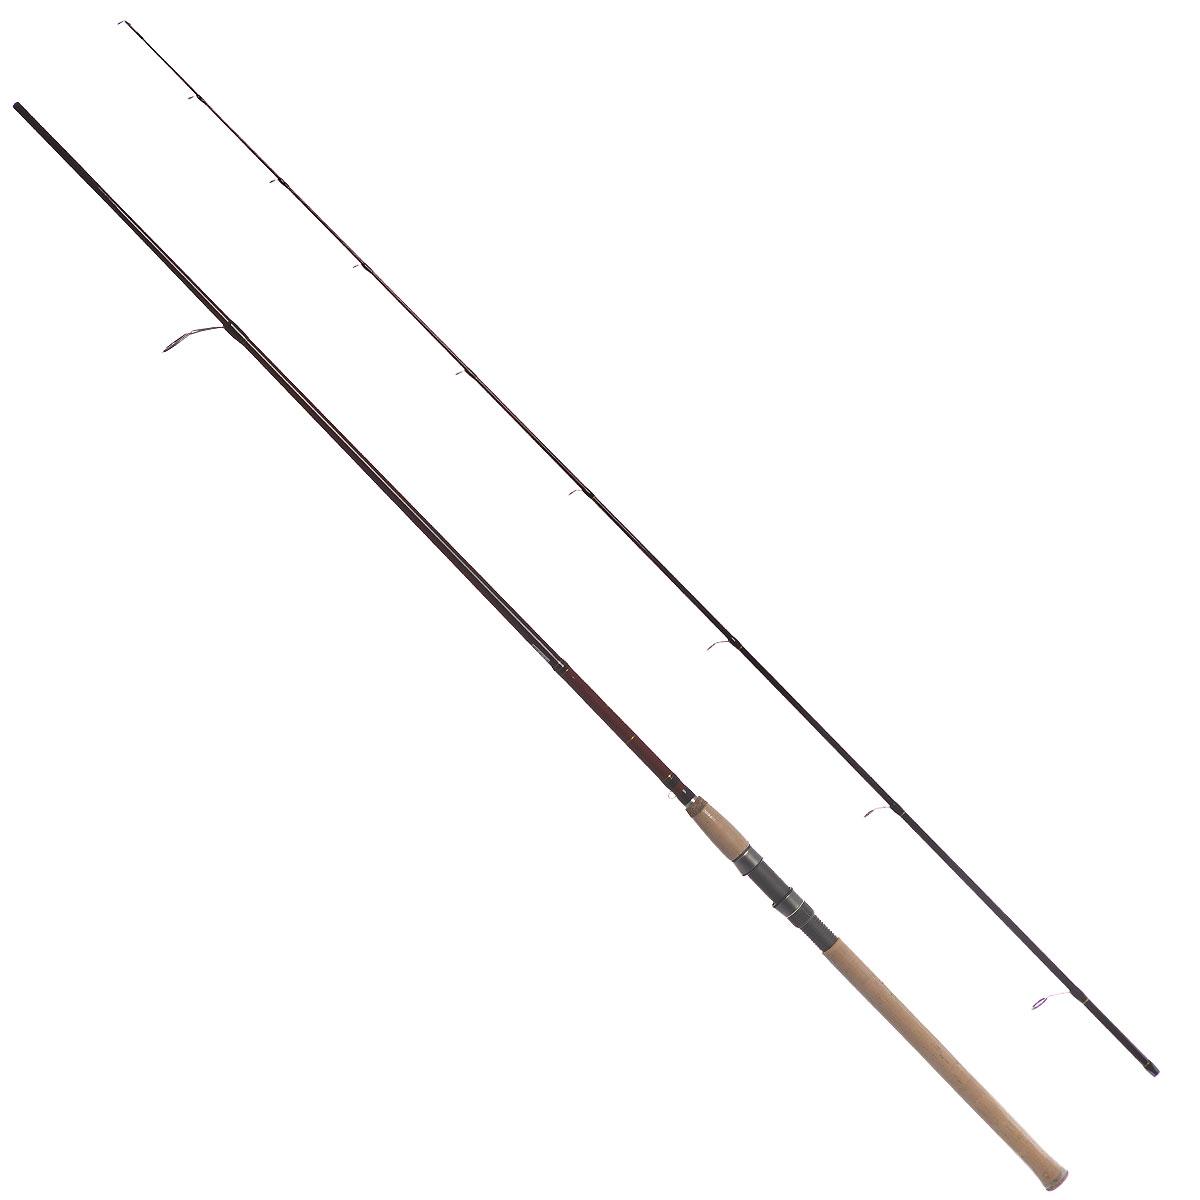 Спиннинг штекерный Daiwa Vulcan Supreme, 2,7 м, 7-28 г